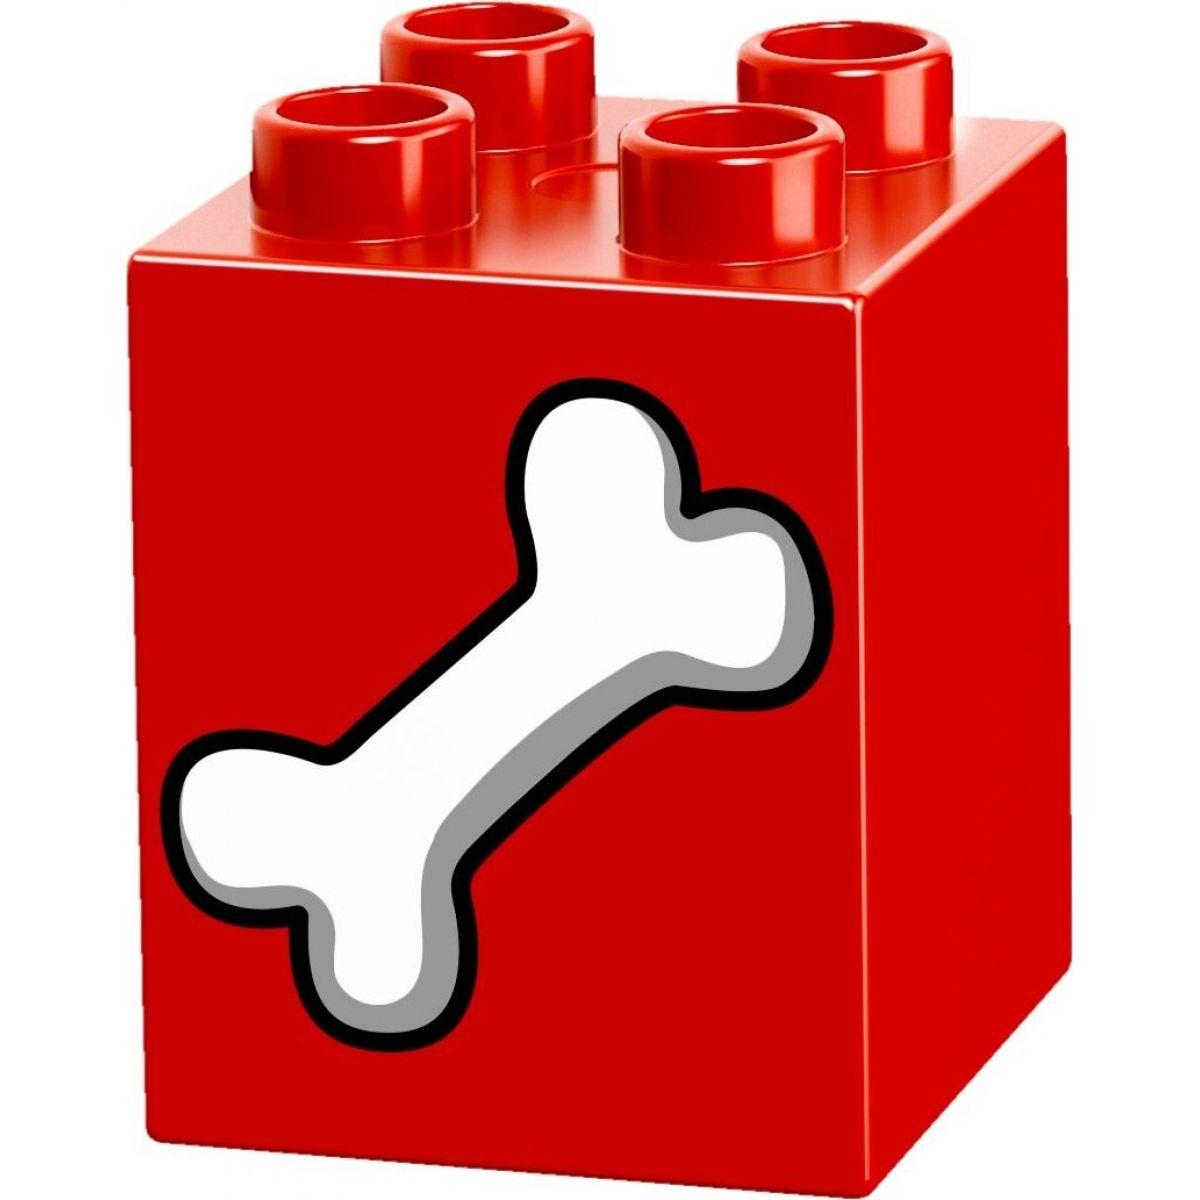 LEGO DUPLO 10858 Moji první skládací mazlíčci #6